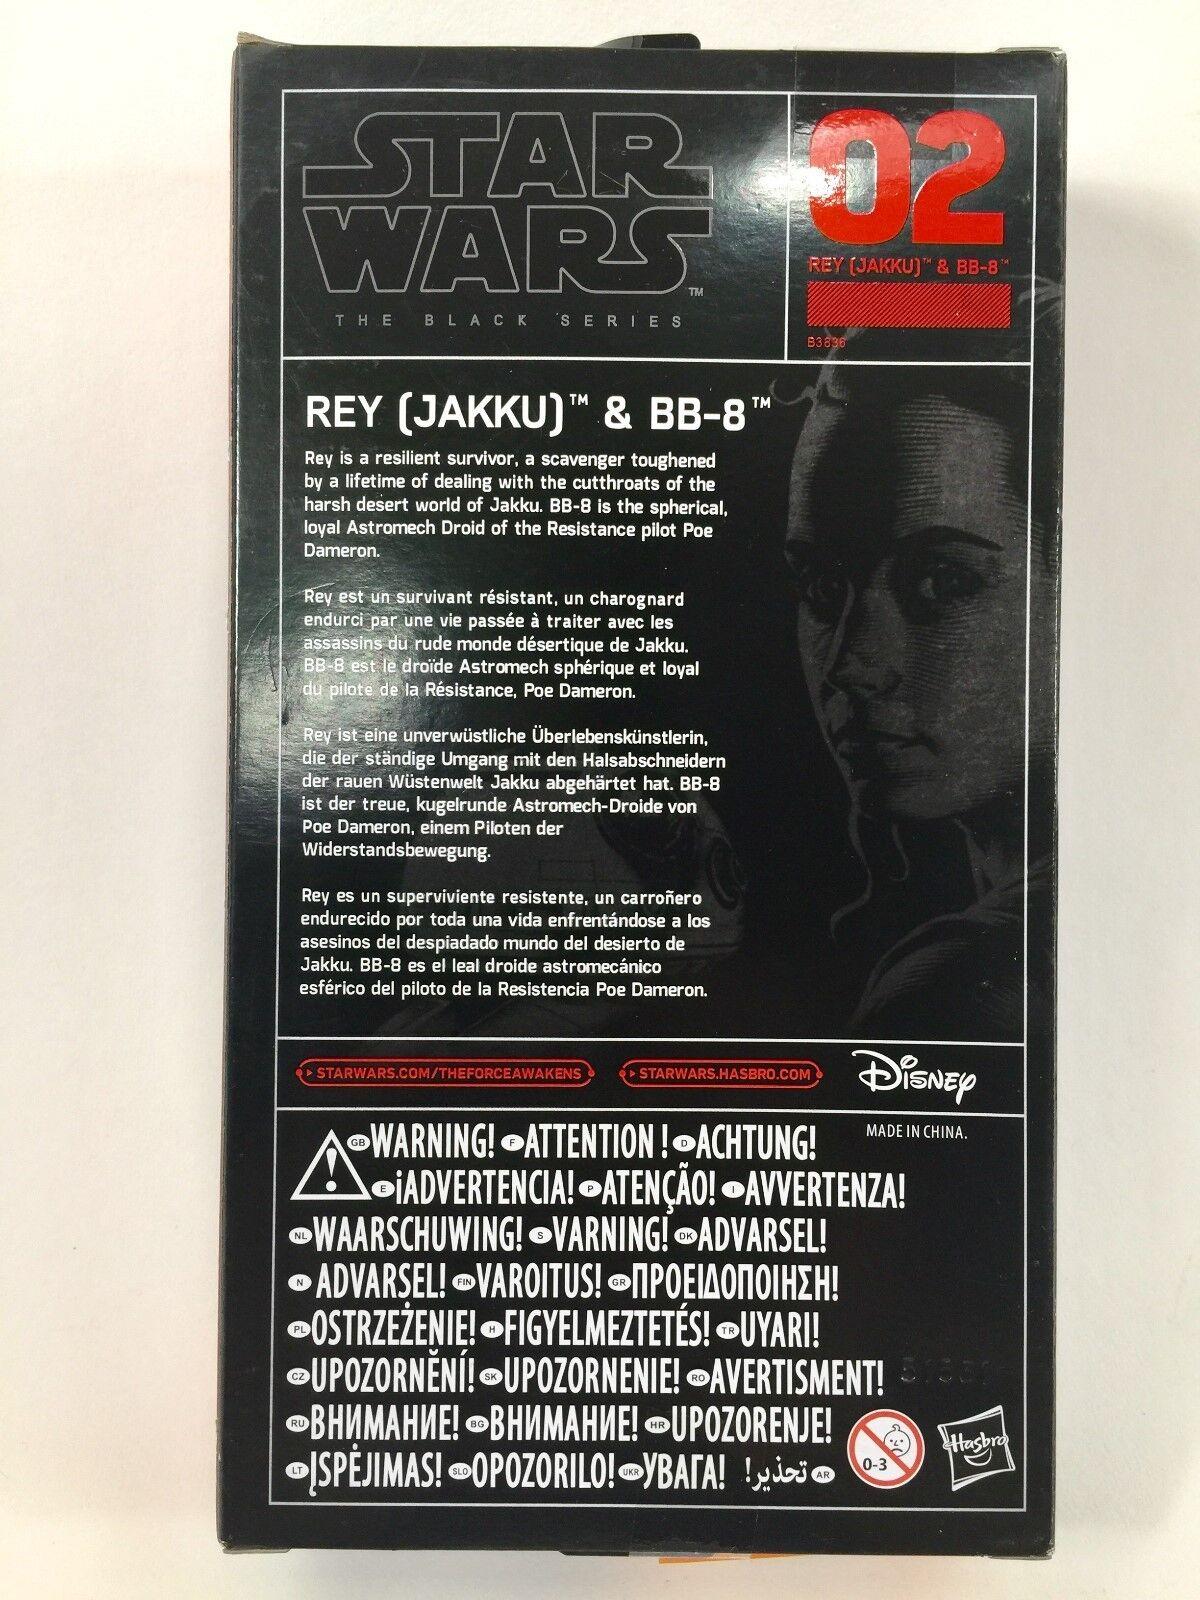 Star Wars The Force Awakens Lot of of of 5 - Finn Rey Kylo Ren Stormtrooper Chewbacca 3a049e